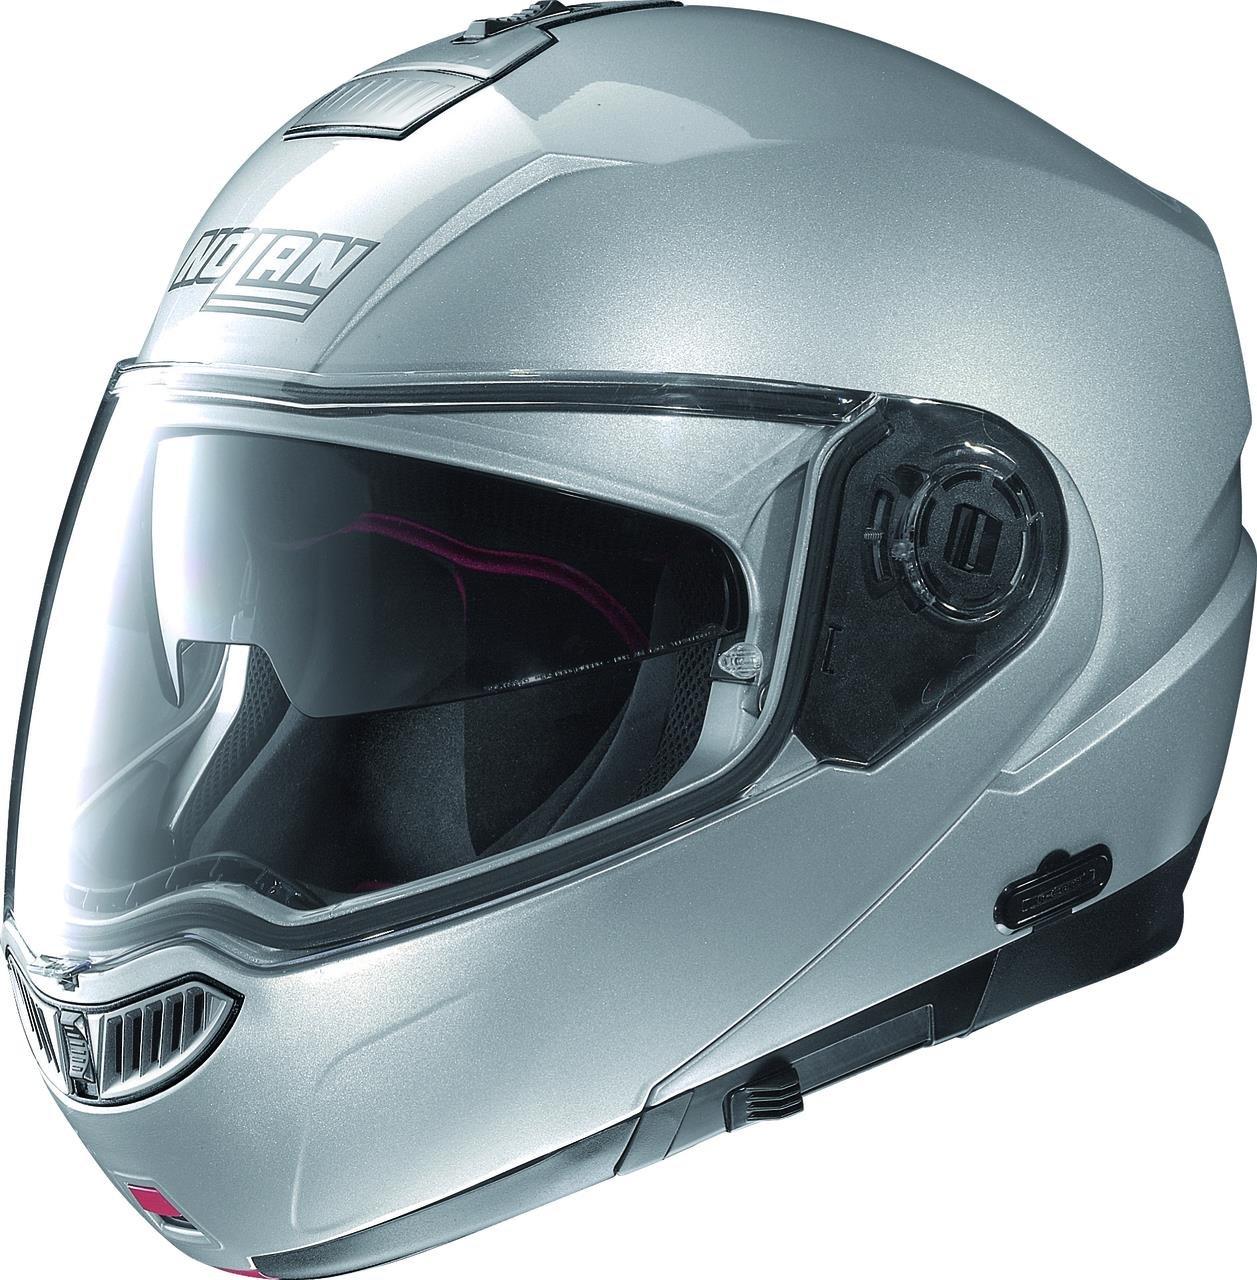 Nolan N104 Evo Solid Helmet (Platinum Silver, Large)